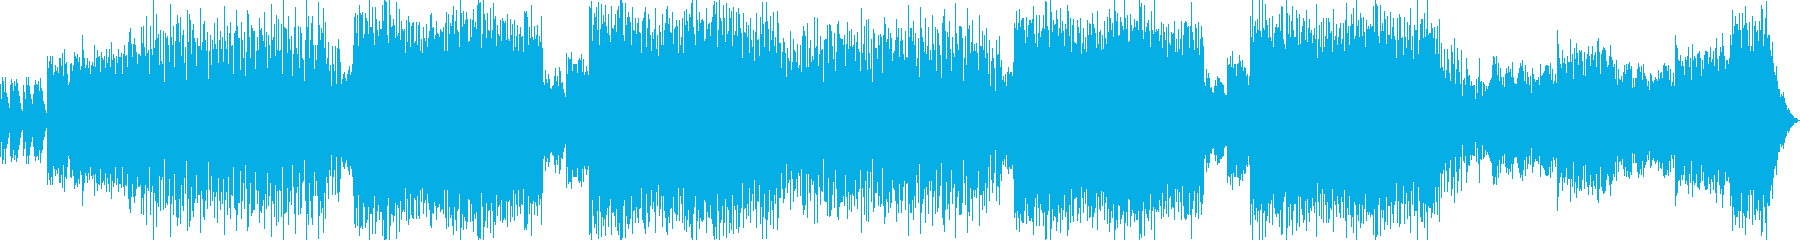 EDM調のBGMの再生済みの波形